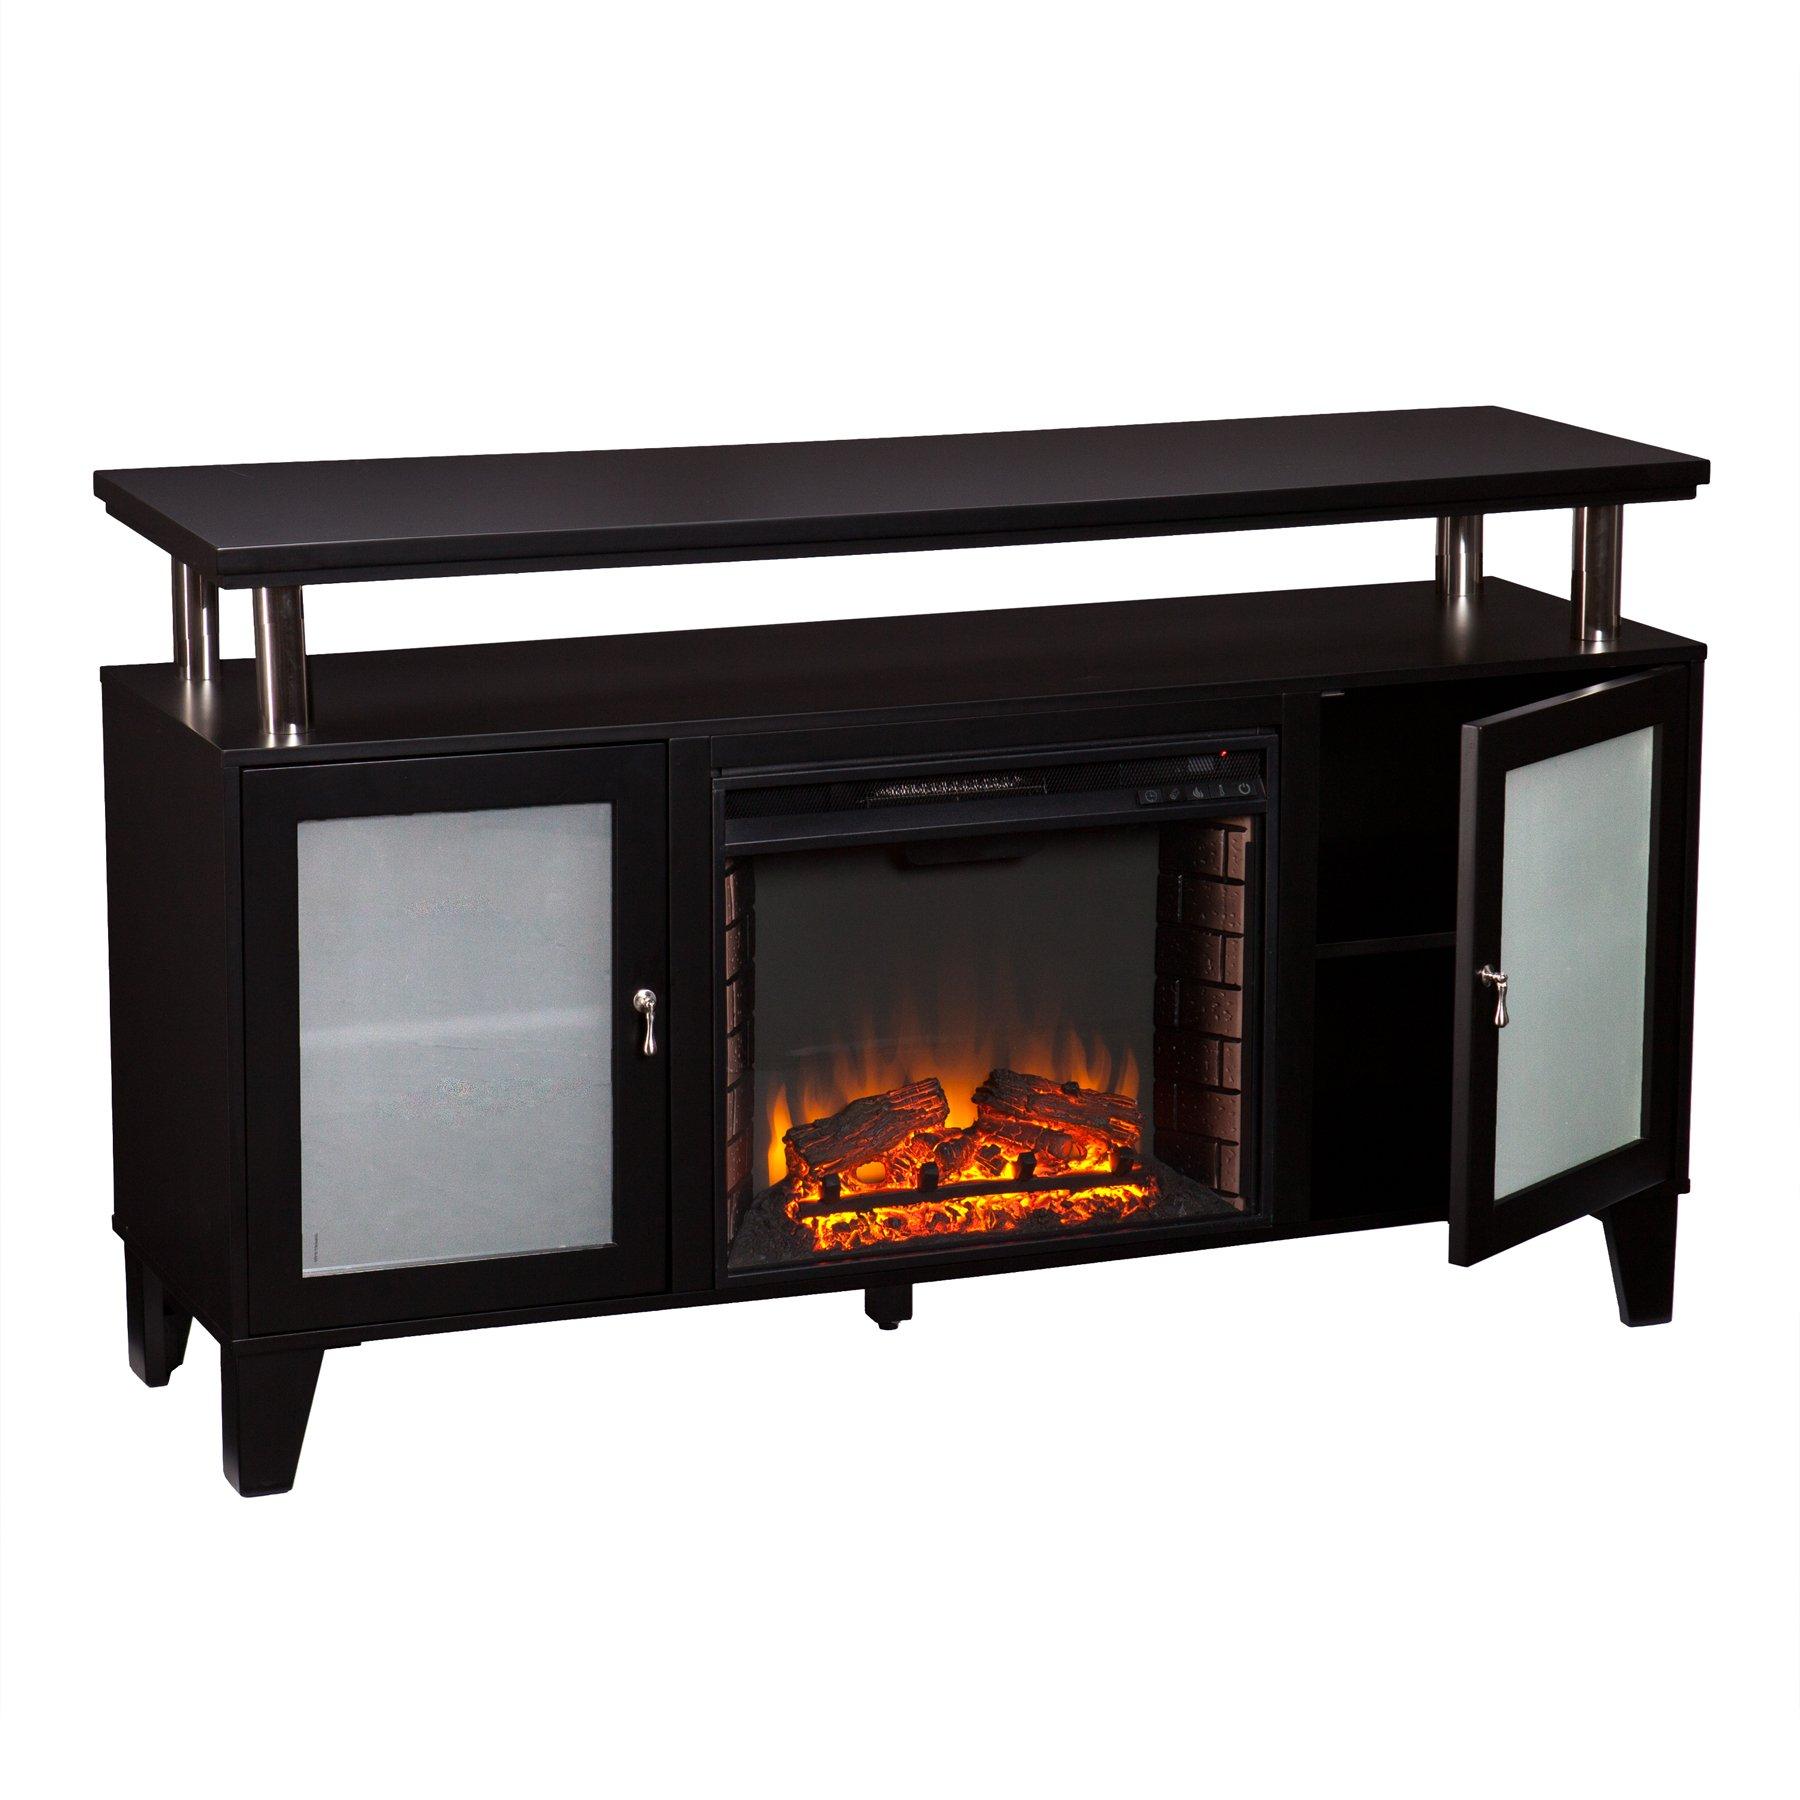 Southern Enterprises Cabrini Media Electric Fireplace 60'' Wide, Black Finish